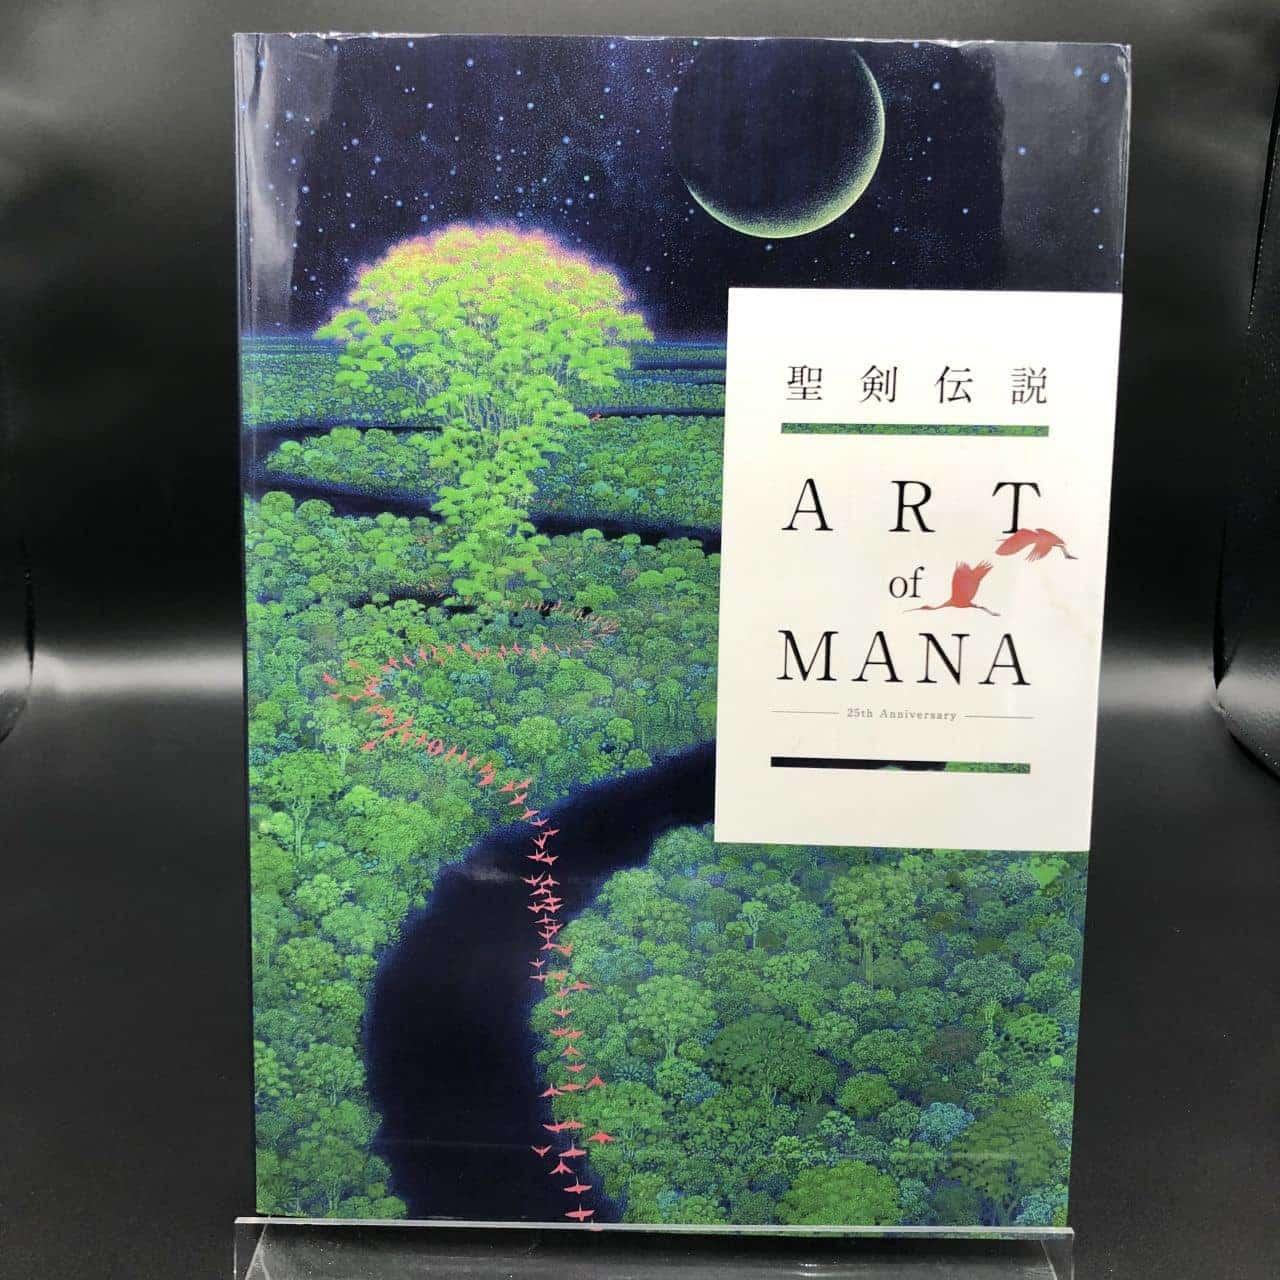 Art of Mana - Artbook 25th Anniversary (jap.) (Sehr gut)